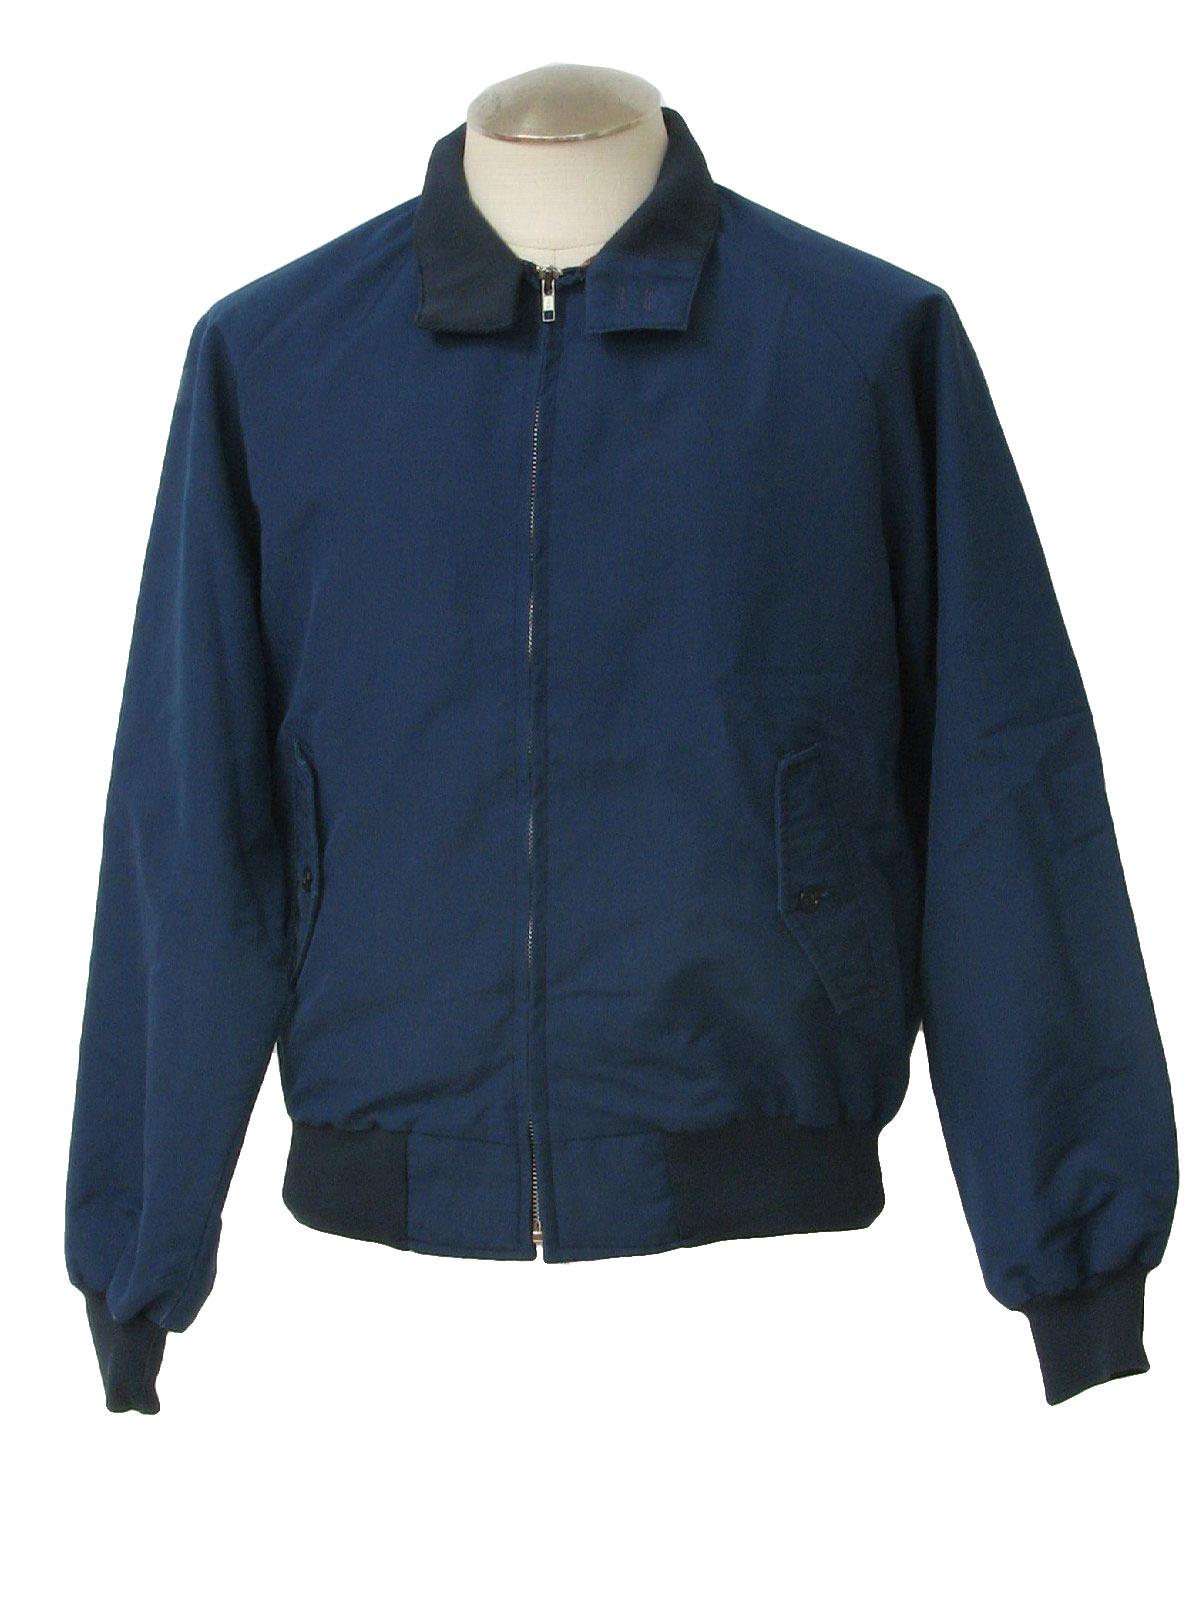 Navy Blue Jacket Womens